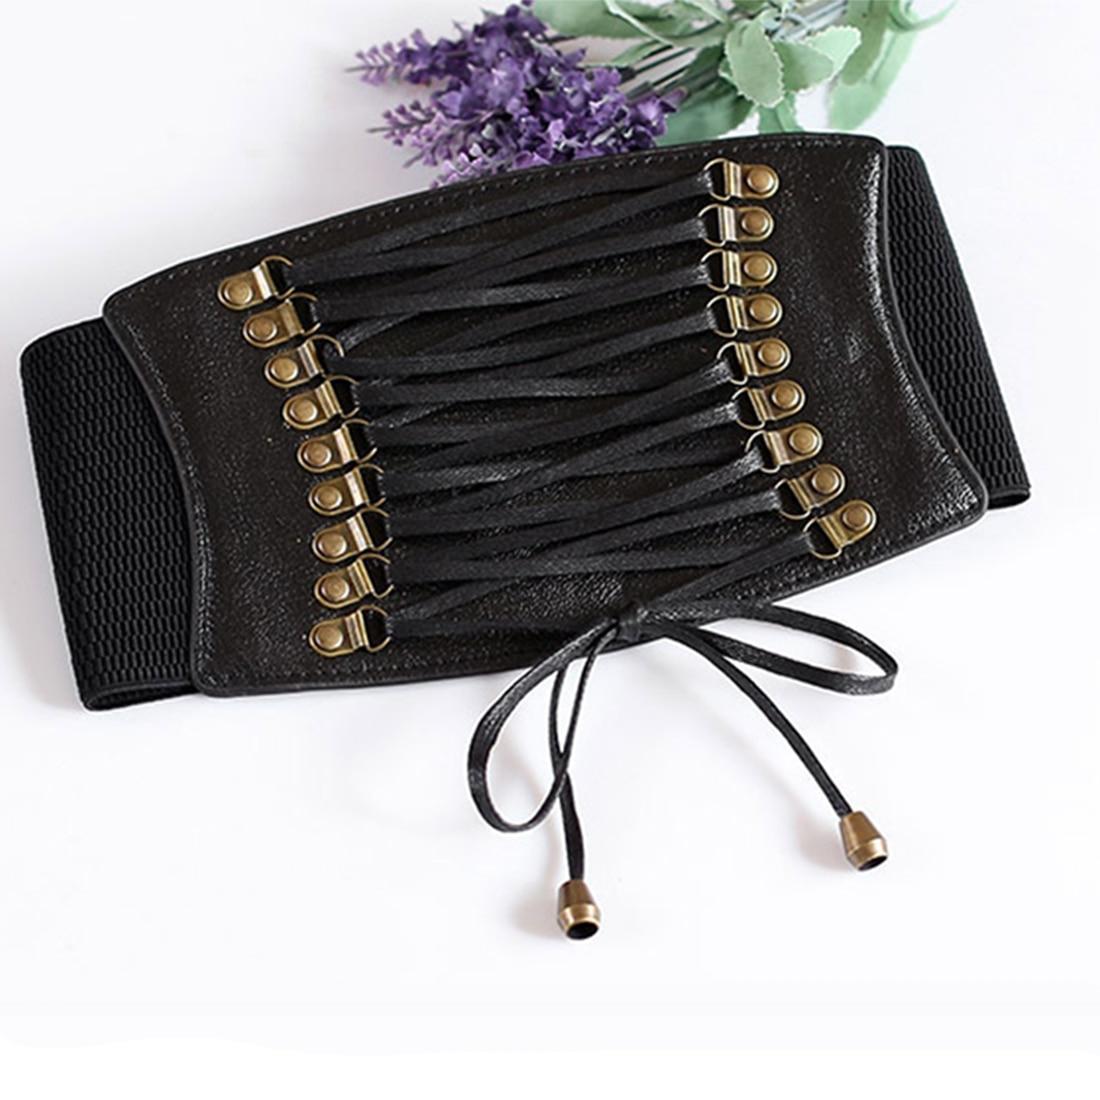 Charming Women Ladies Strap Buckle Cinch Belts Corset Stretch Skinny Waistband High Waist Slimming Waist Belts